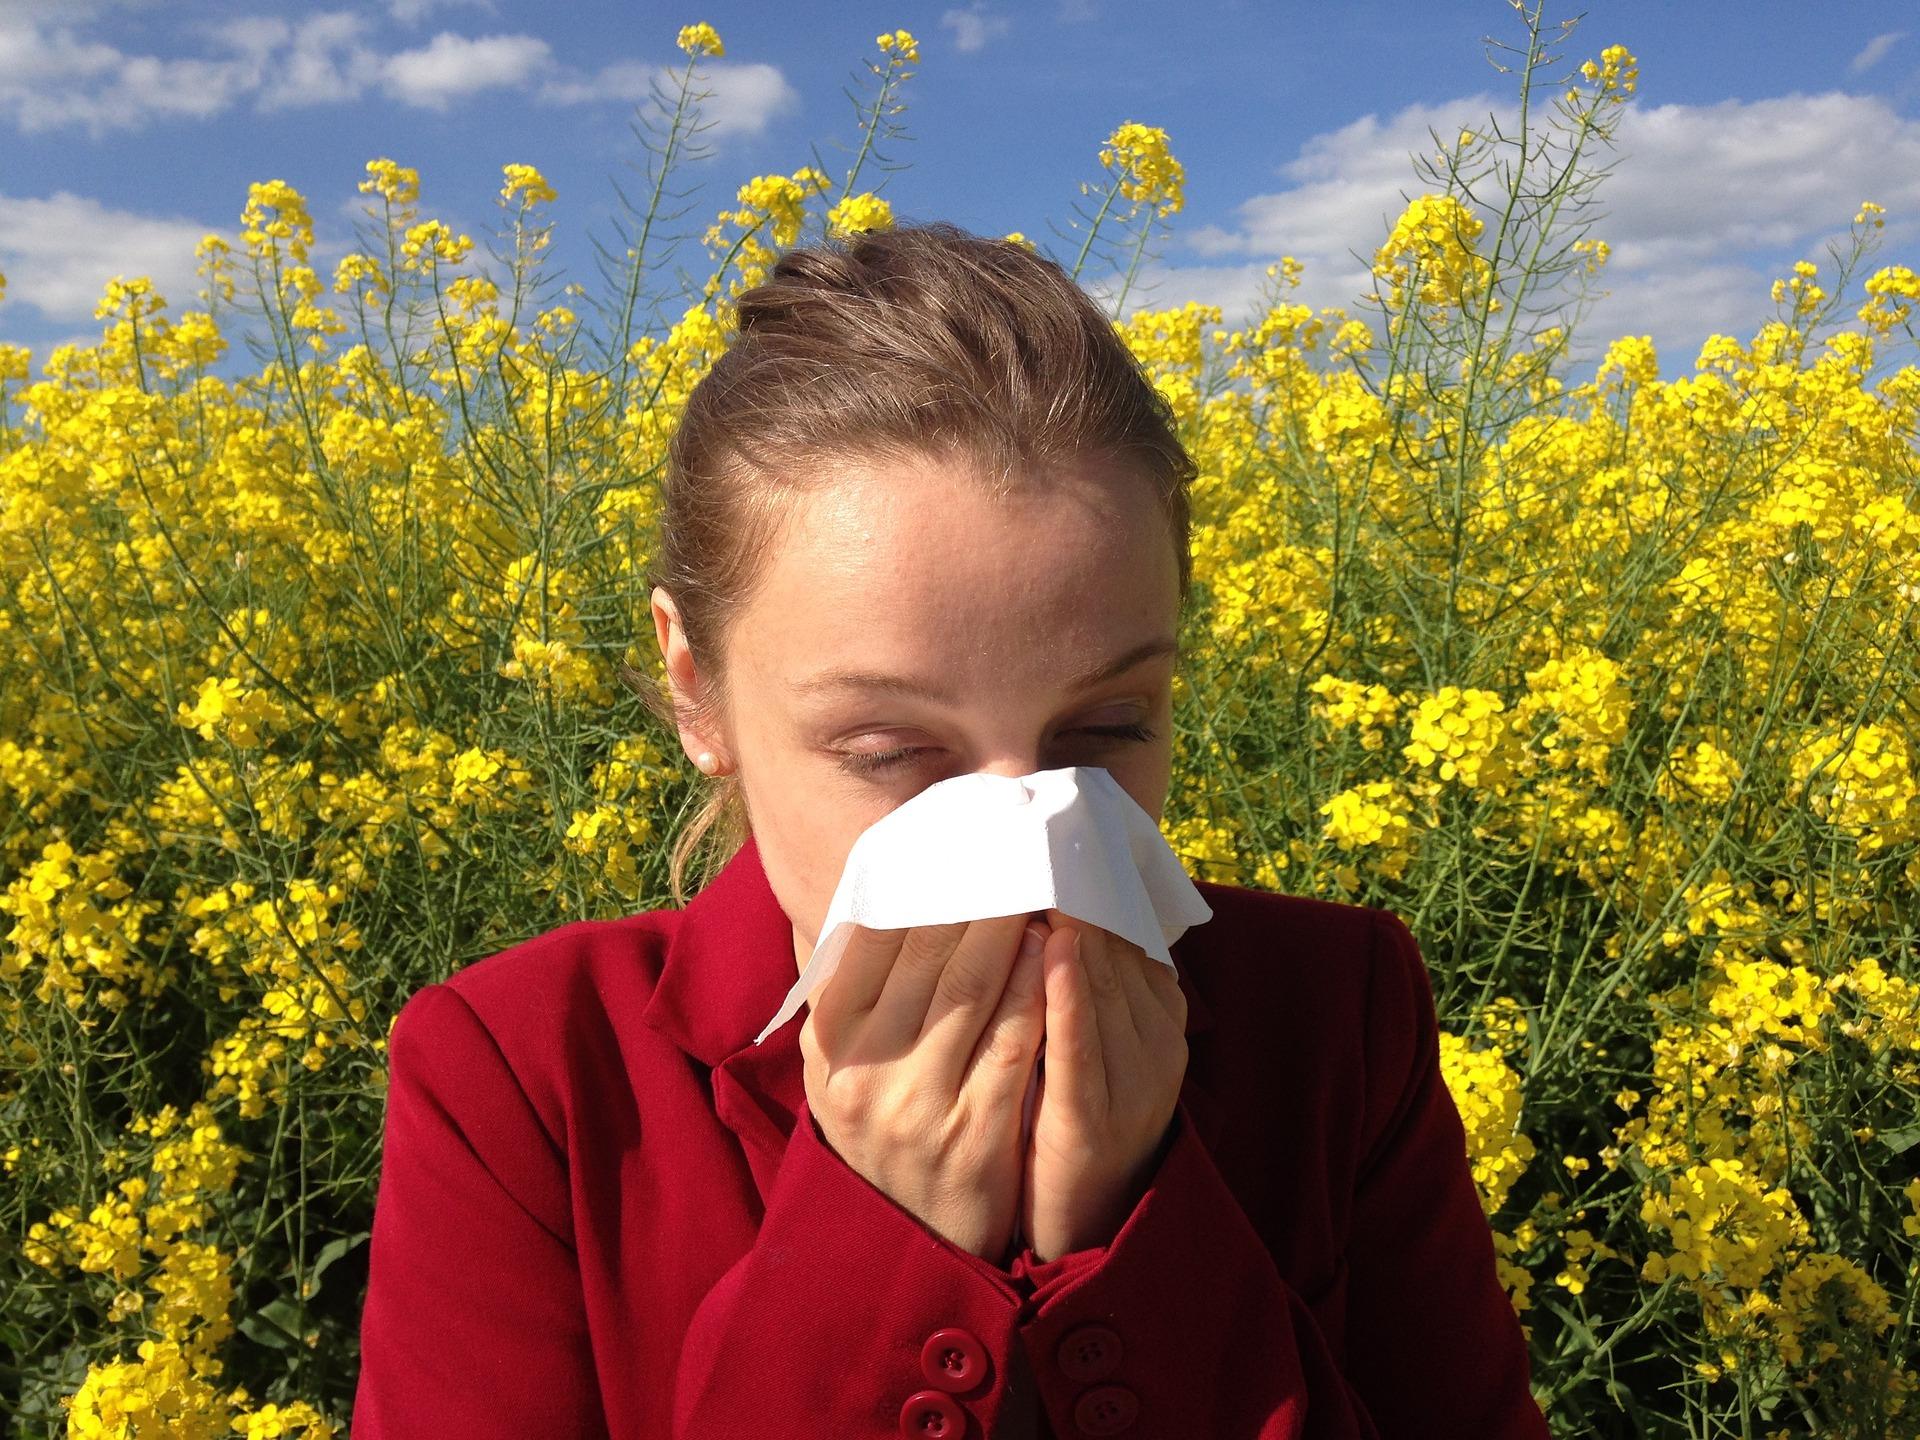 Health allergies